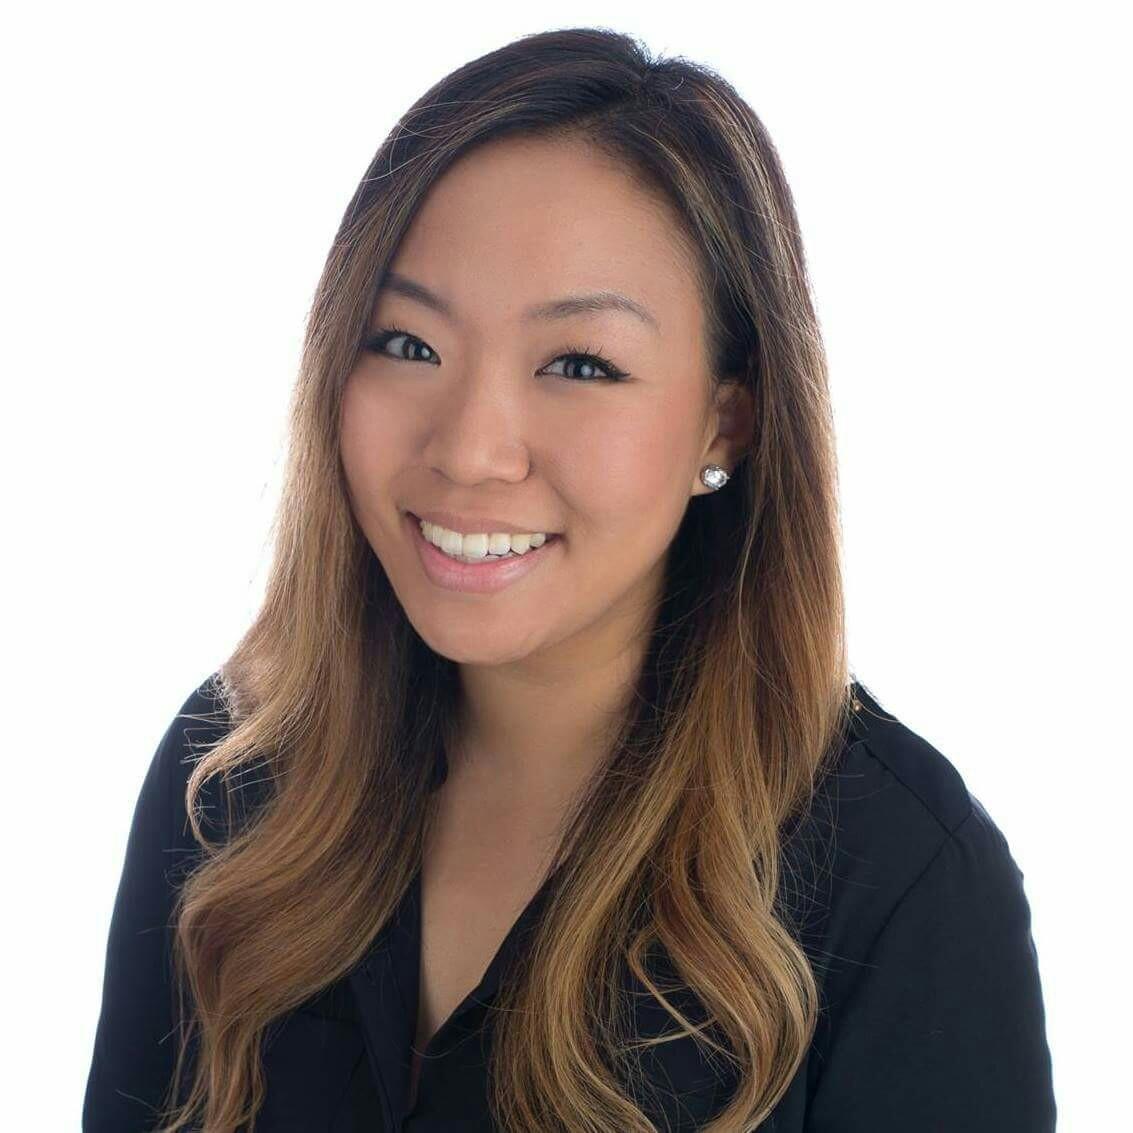 Elizabeth Gina Chun